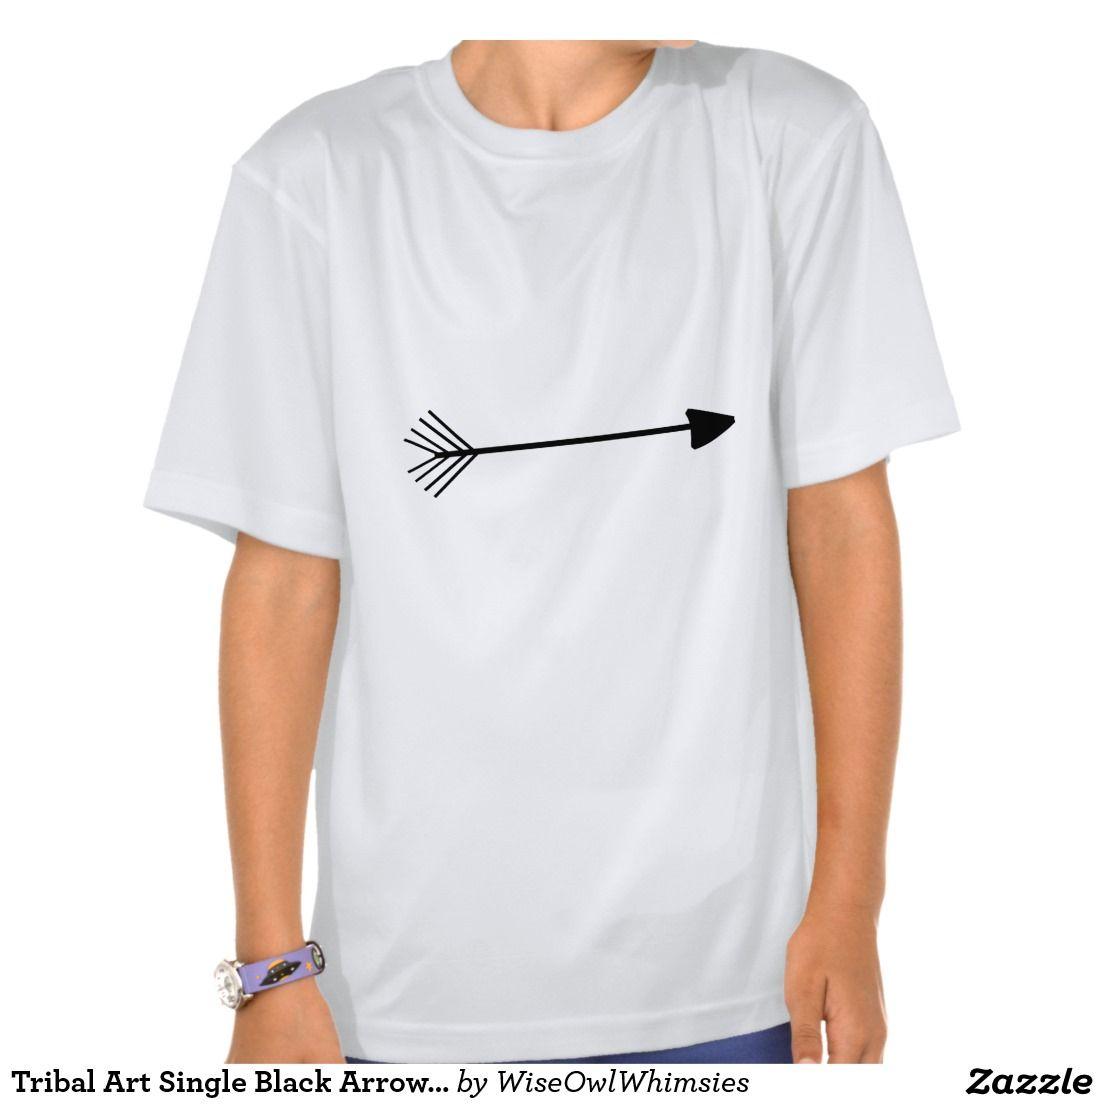 Tribal Art Single Black Arrow Trendy Designs T-shirt, for Girls